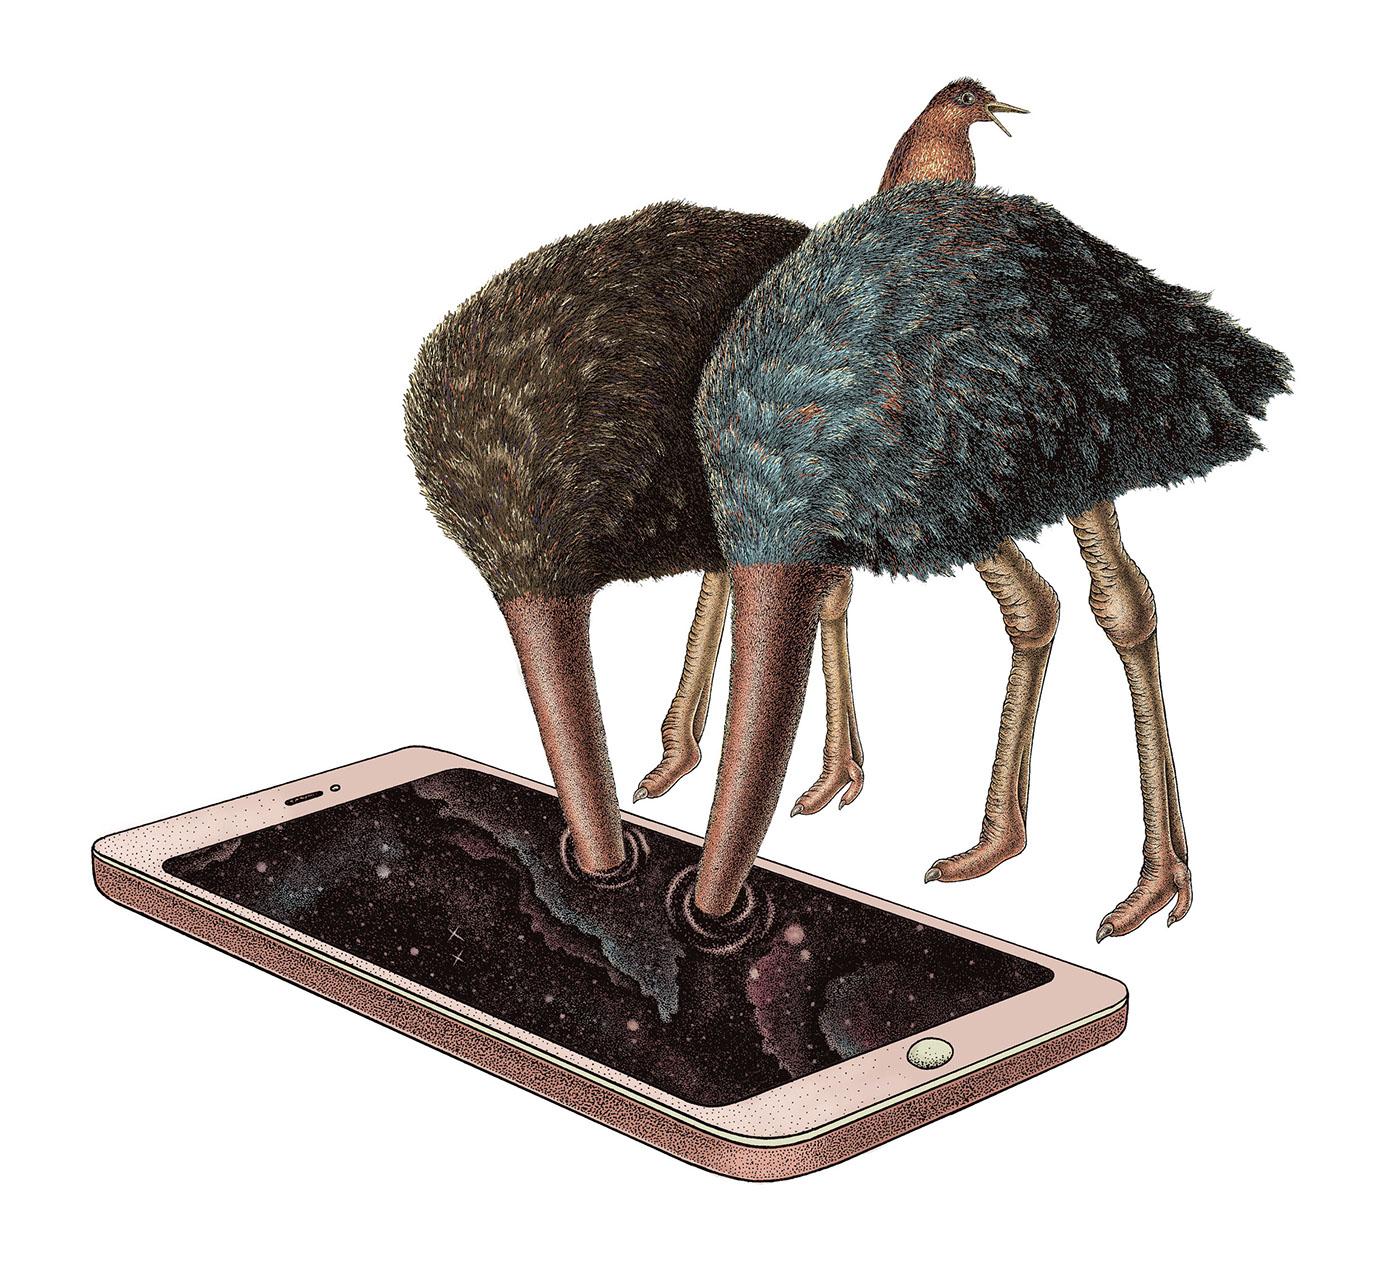 Smartphone vs books / работы Dzmitryi Kashtalyan